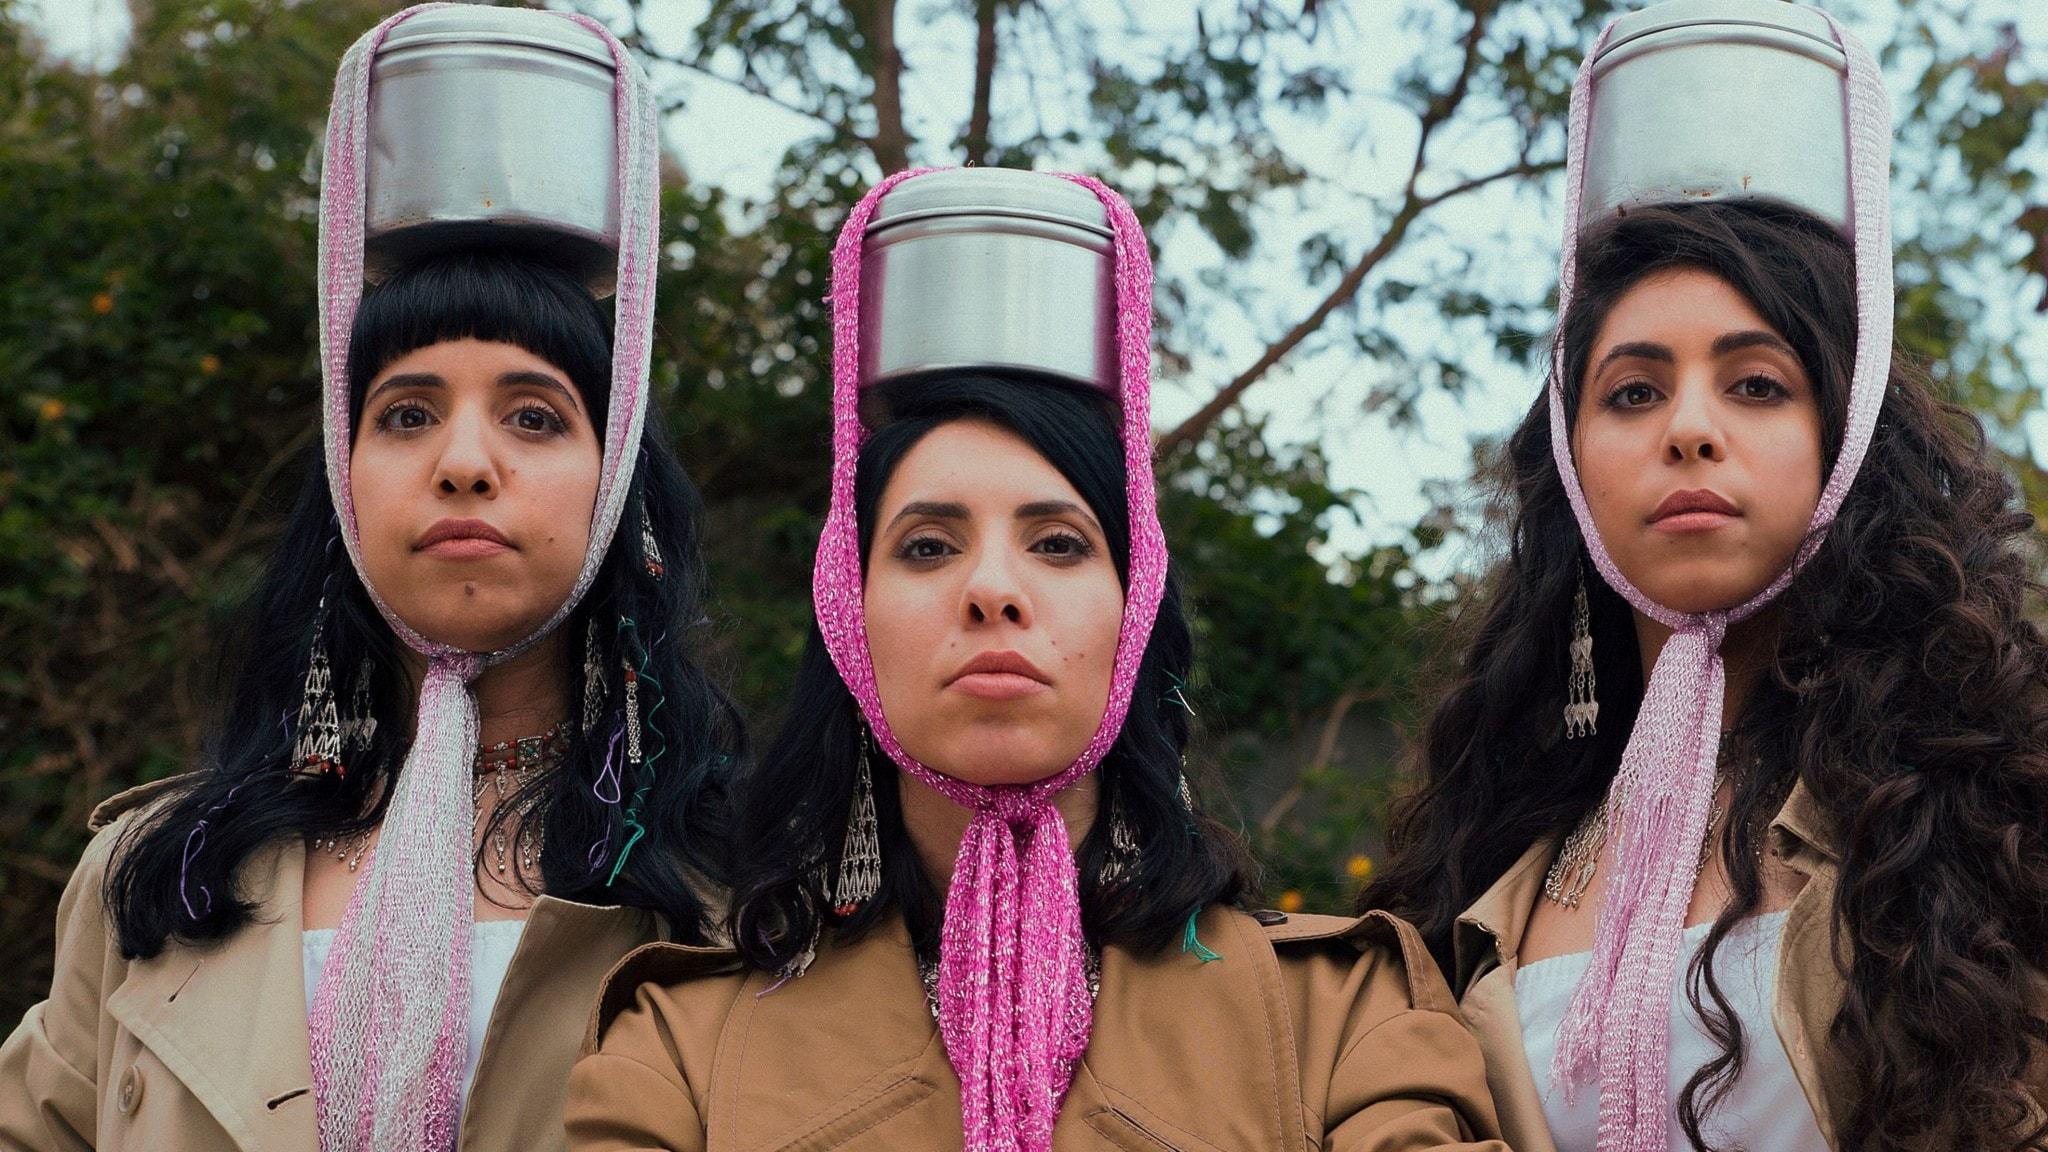 MIXTEJP: Mellanösterns drottningar